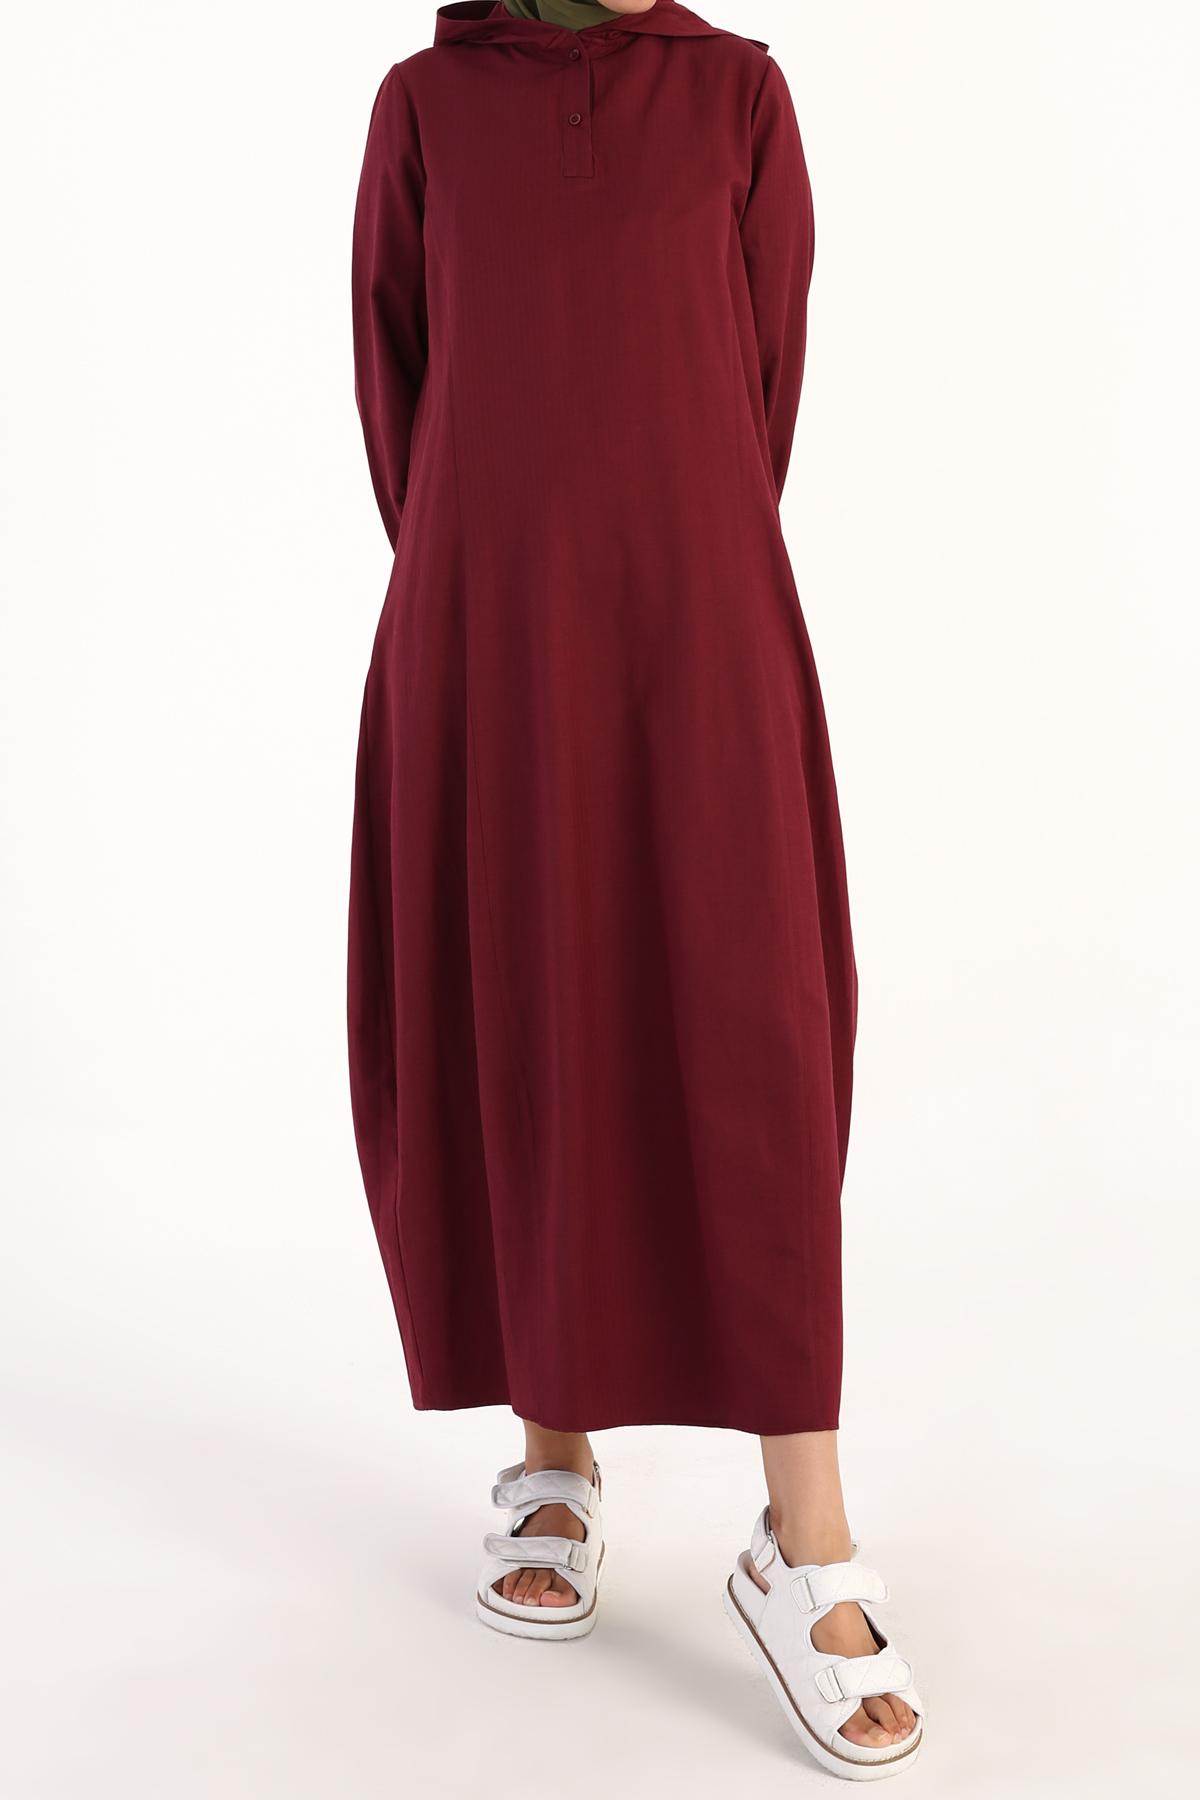 Dökümlü Kapüşonlu Pamuklu Elbise